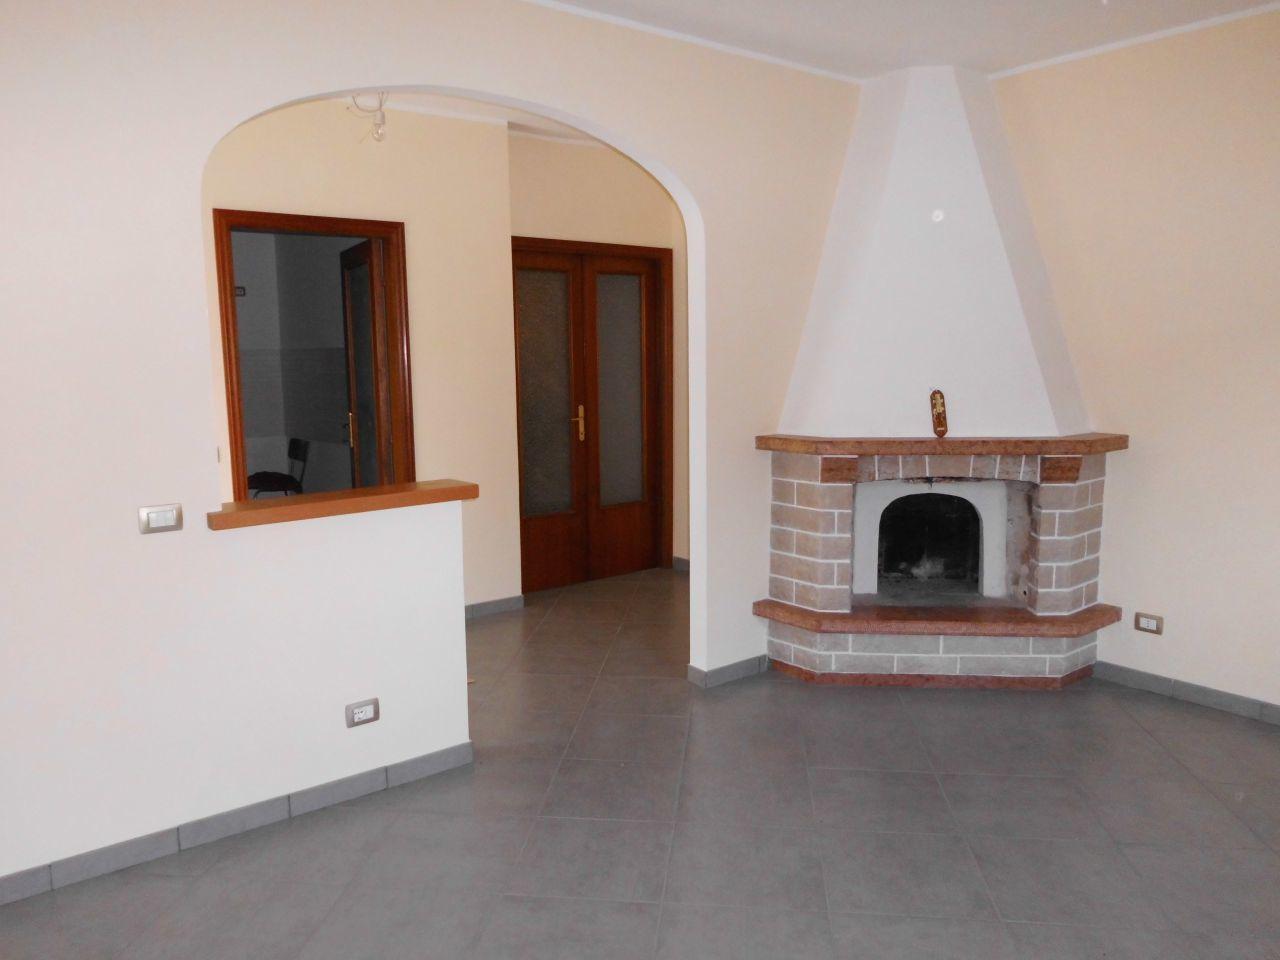 Soluzione Indipendente in vendita a Maiolati Spontini, 5 locali, Trattative riservate | Cambio Casa.it